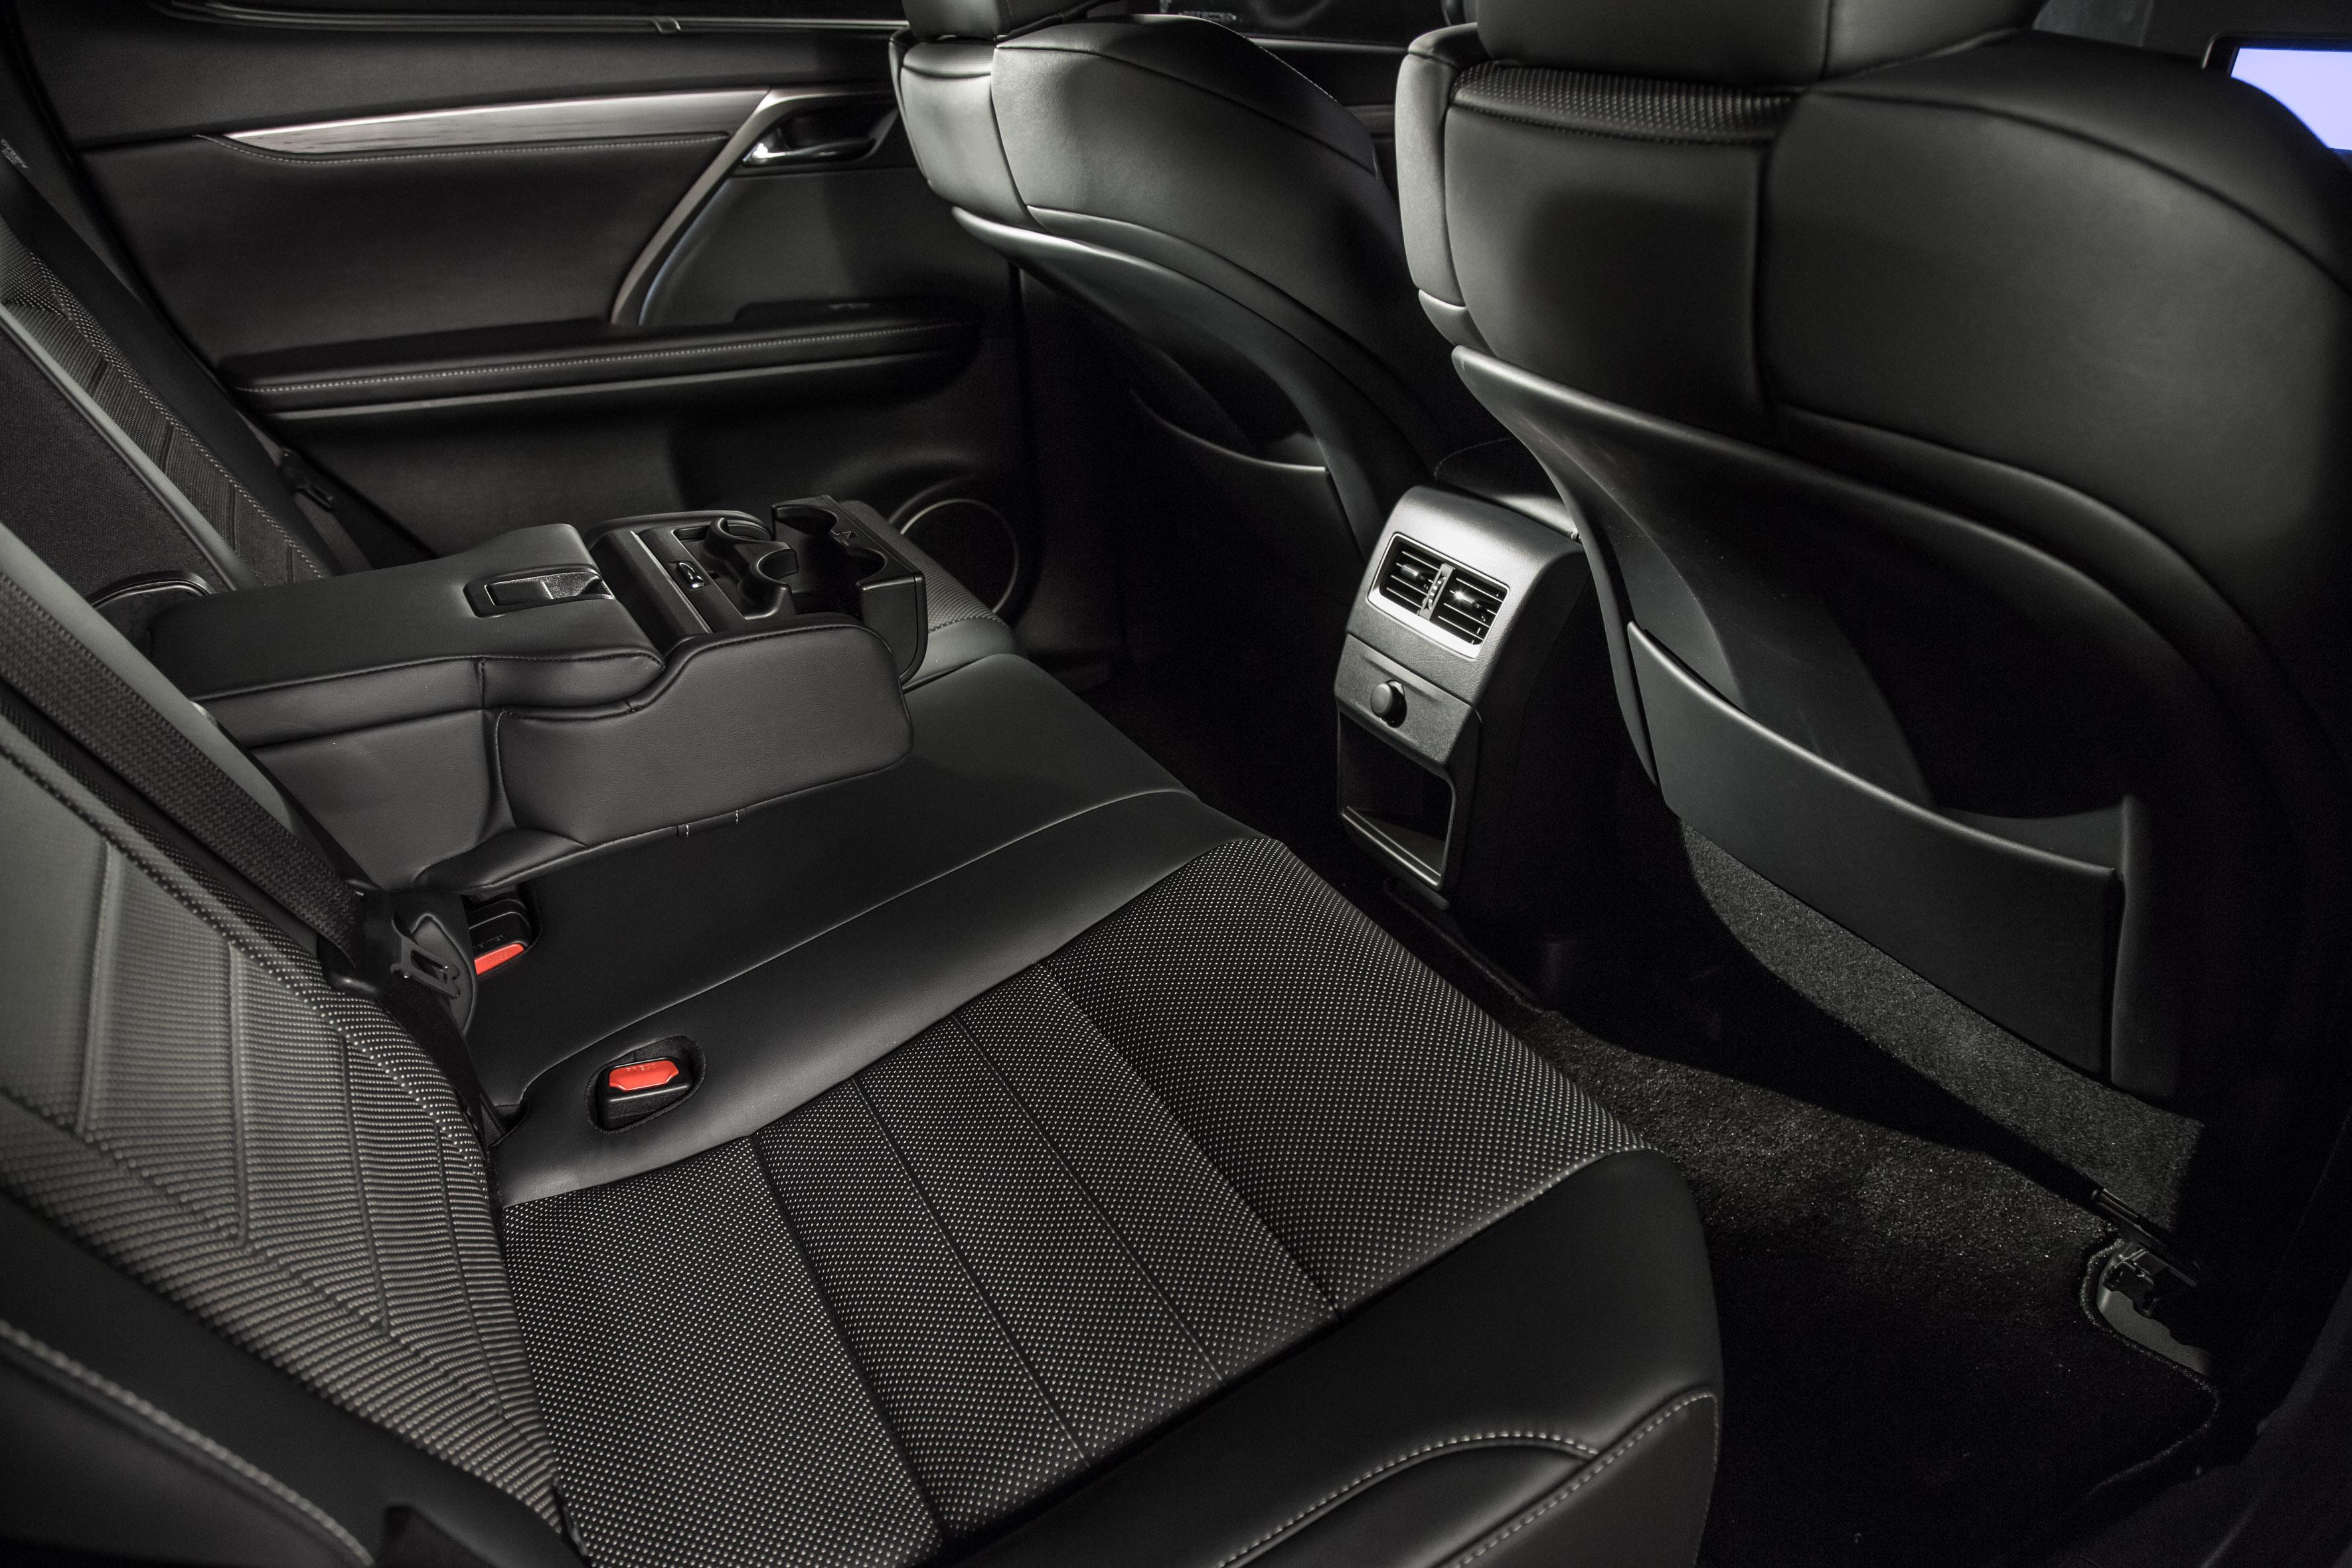 Lexusrx350 37